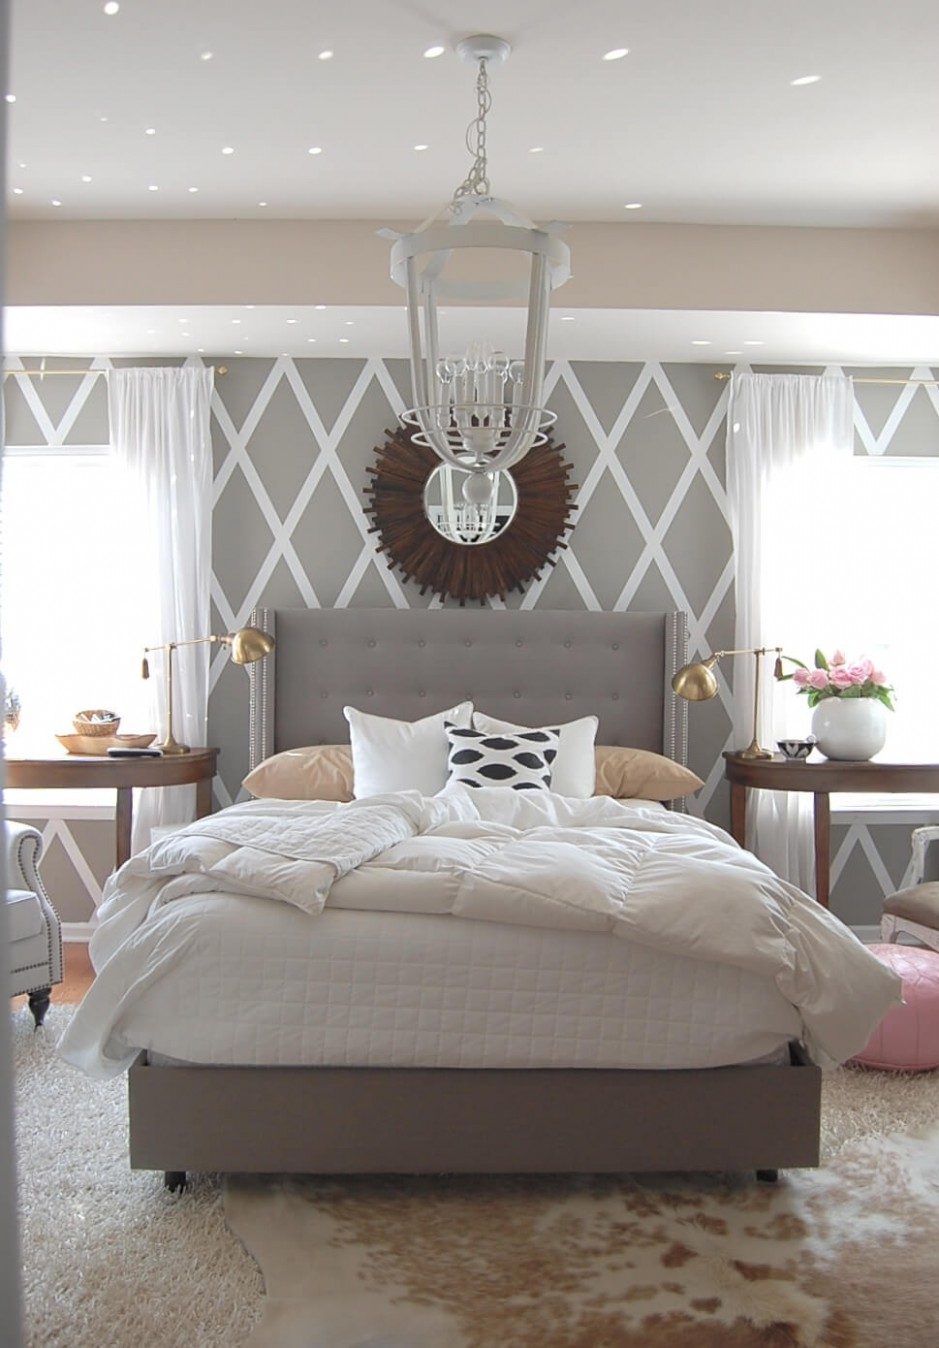 12 Best Grey Bedroom Ideas and Designs for 12 - Bedroom Ideas Grey Bed